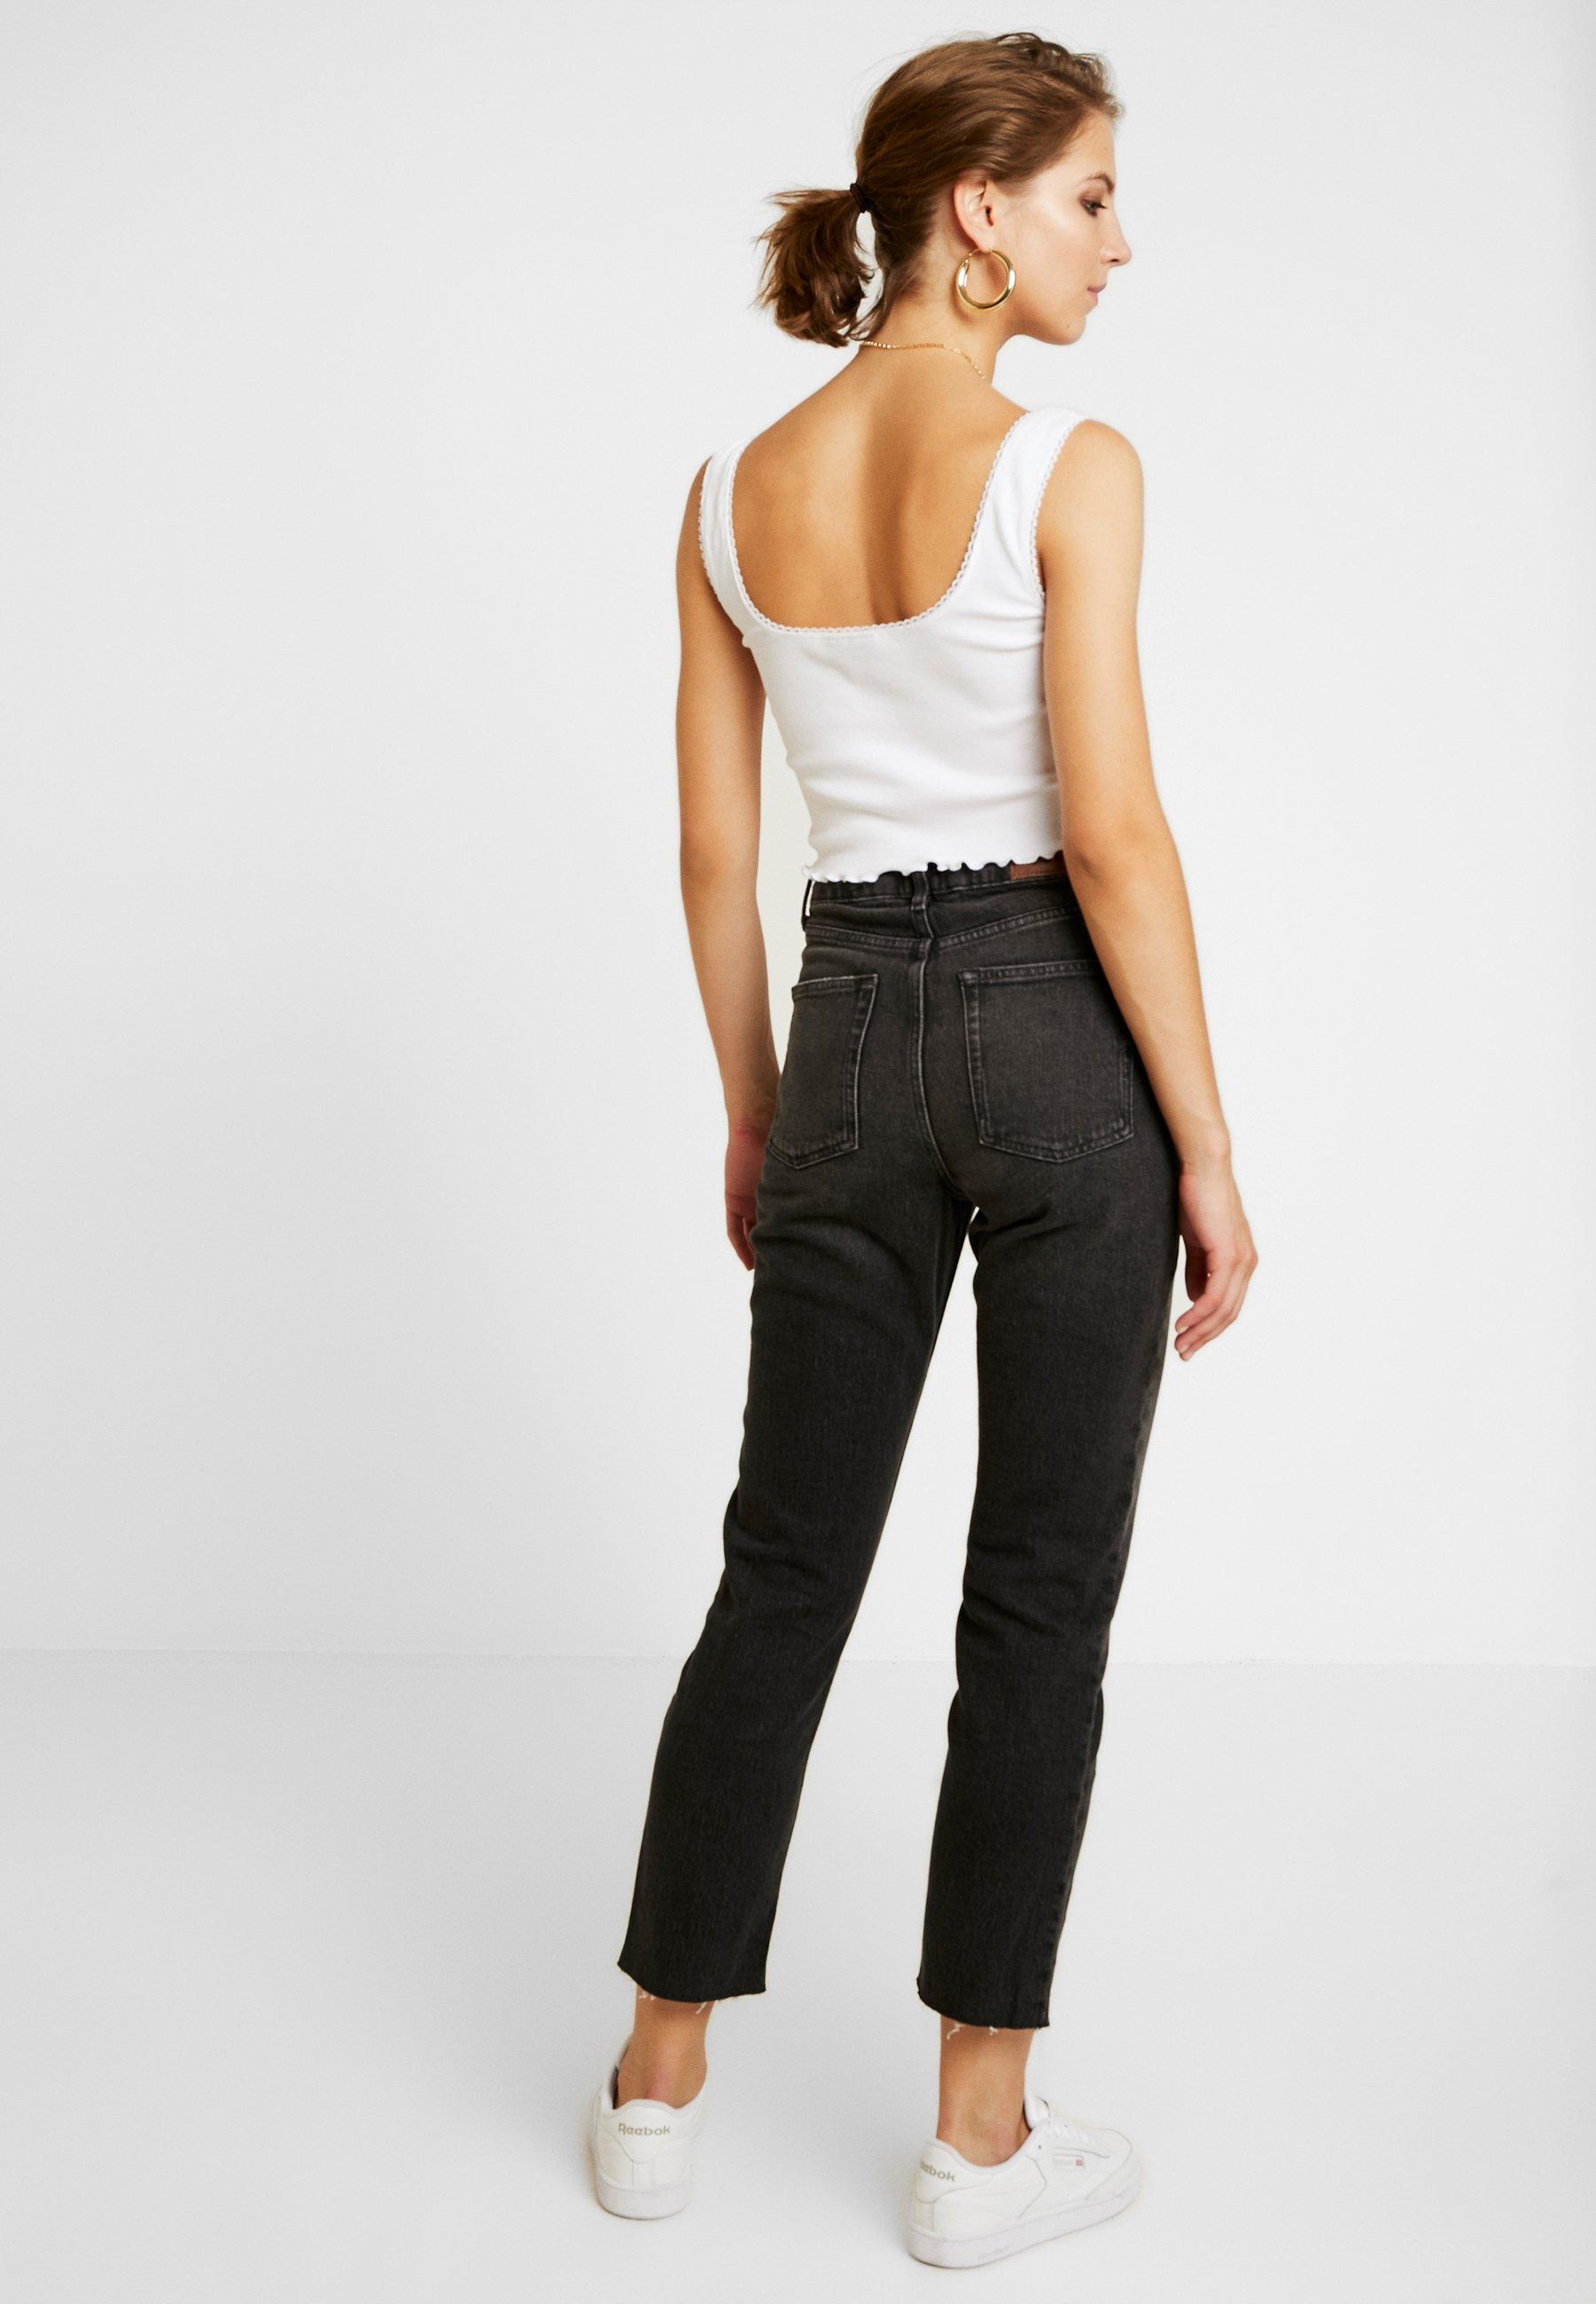 DILLONJean slim BDG black Urban Outfitters 3T5lF1uKJc